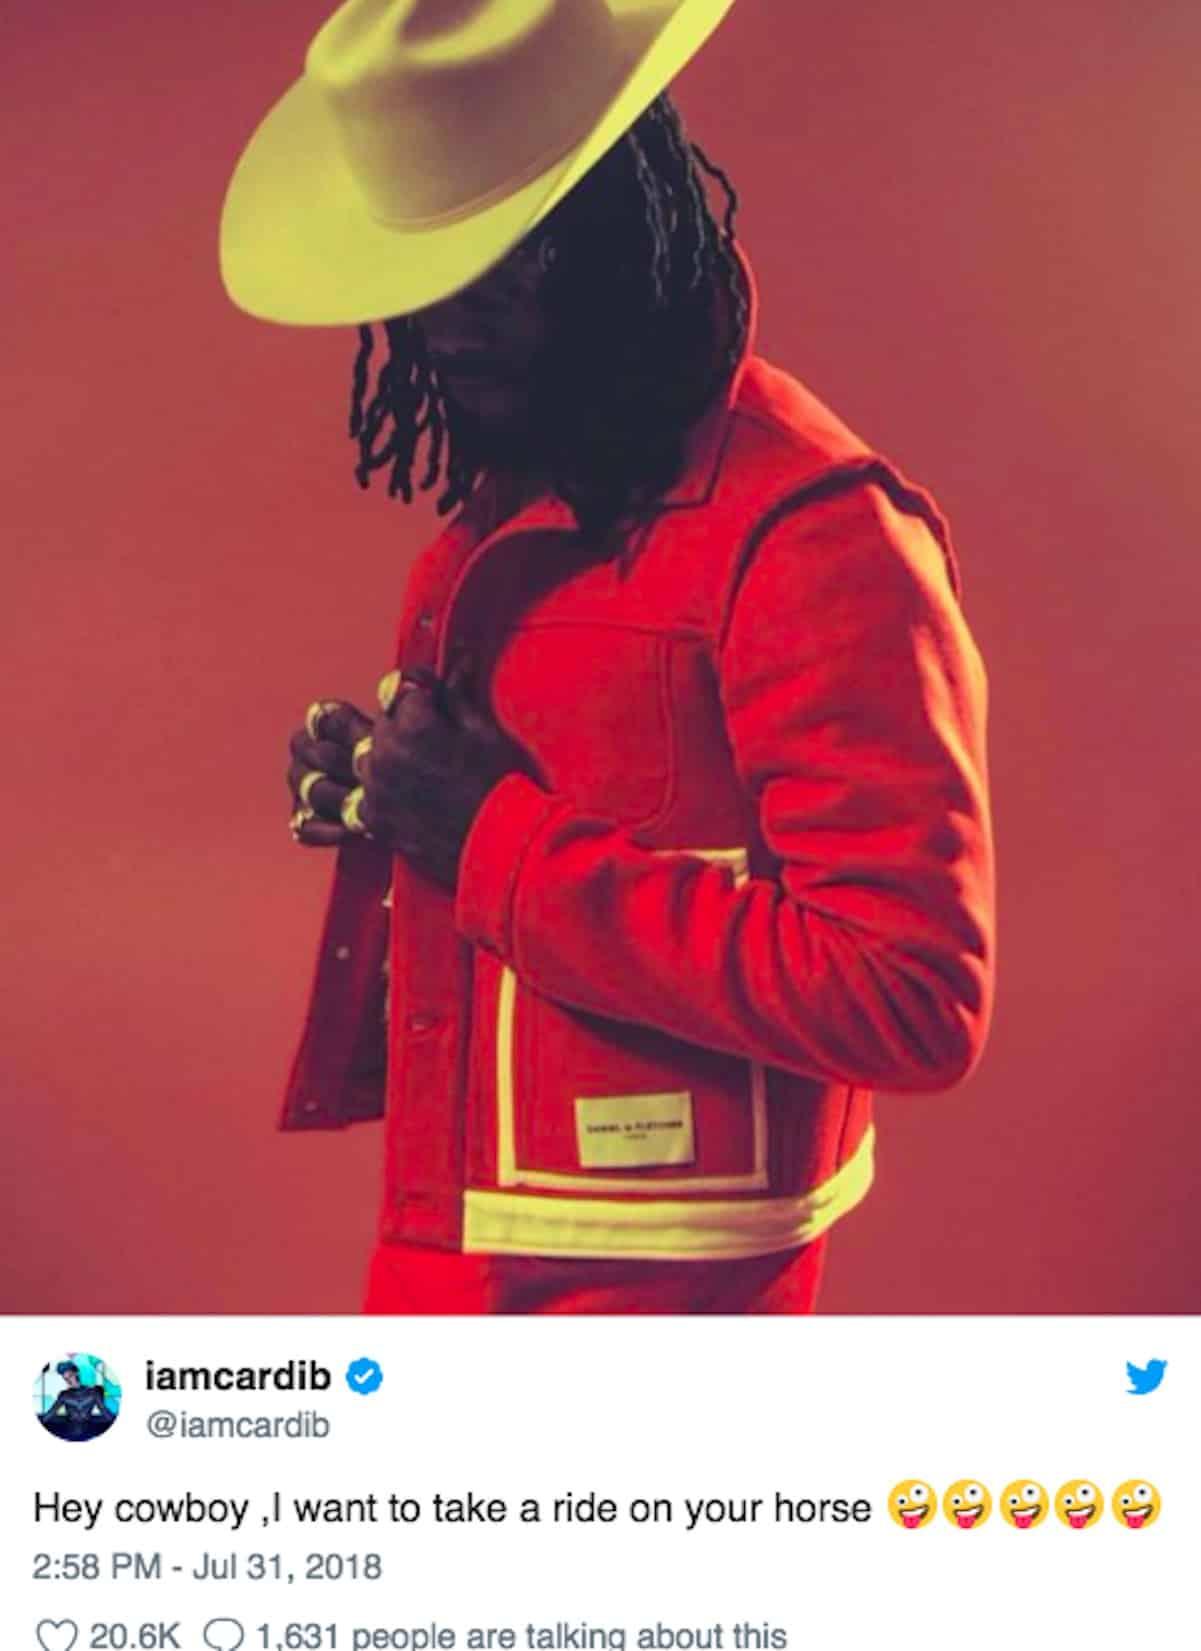 cardi b offset cowboy